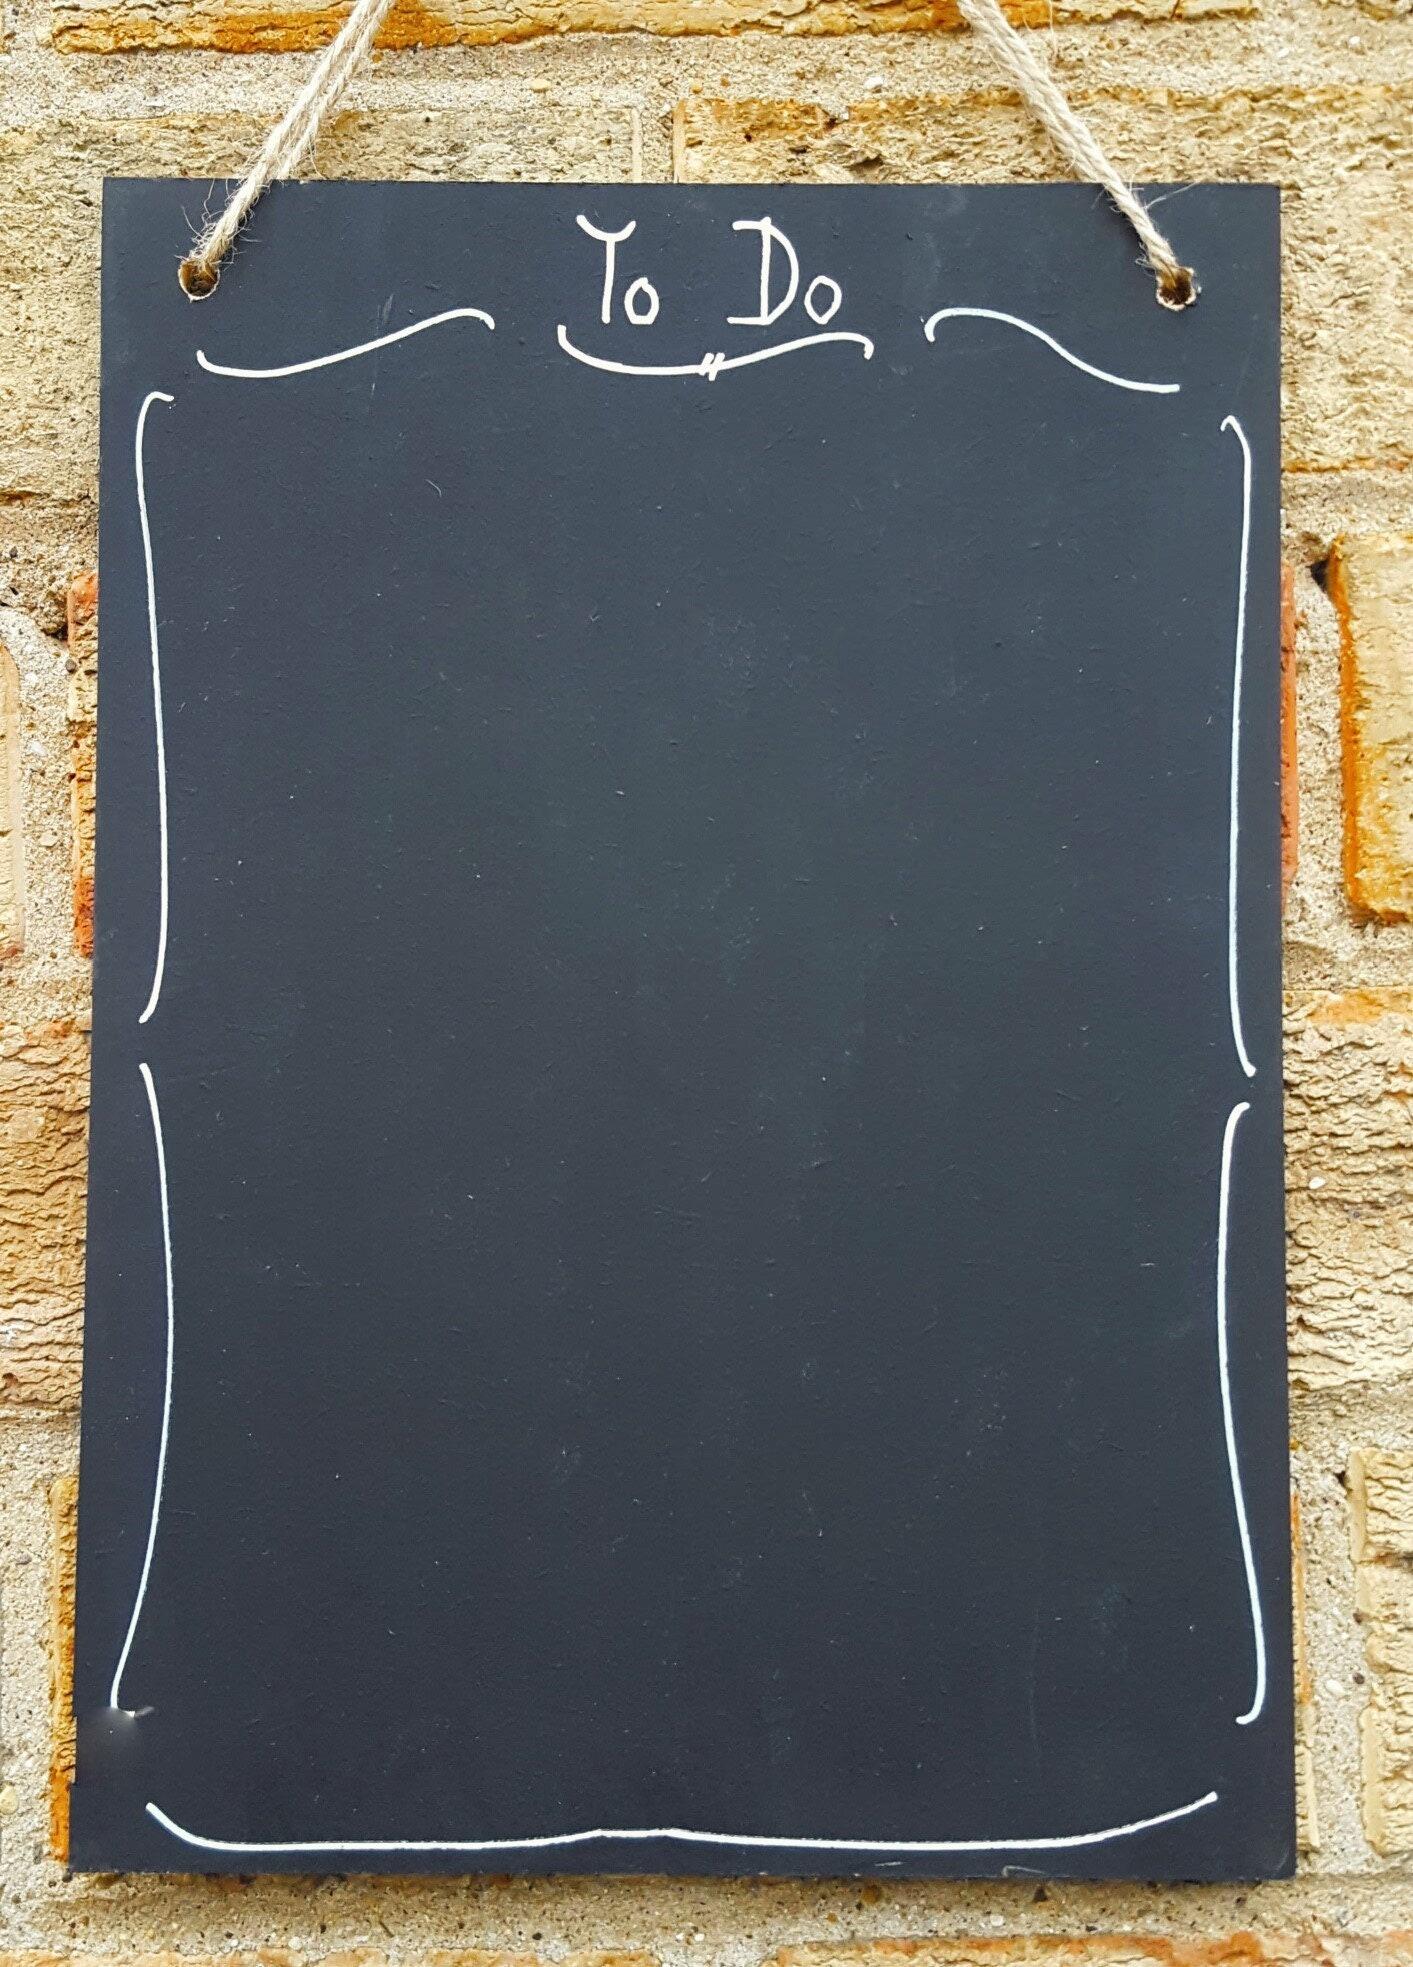 A3 Chalkboard Menu Shabby Chic Landscape Large Blackboard Free P/&P 30cm x 42cm